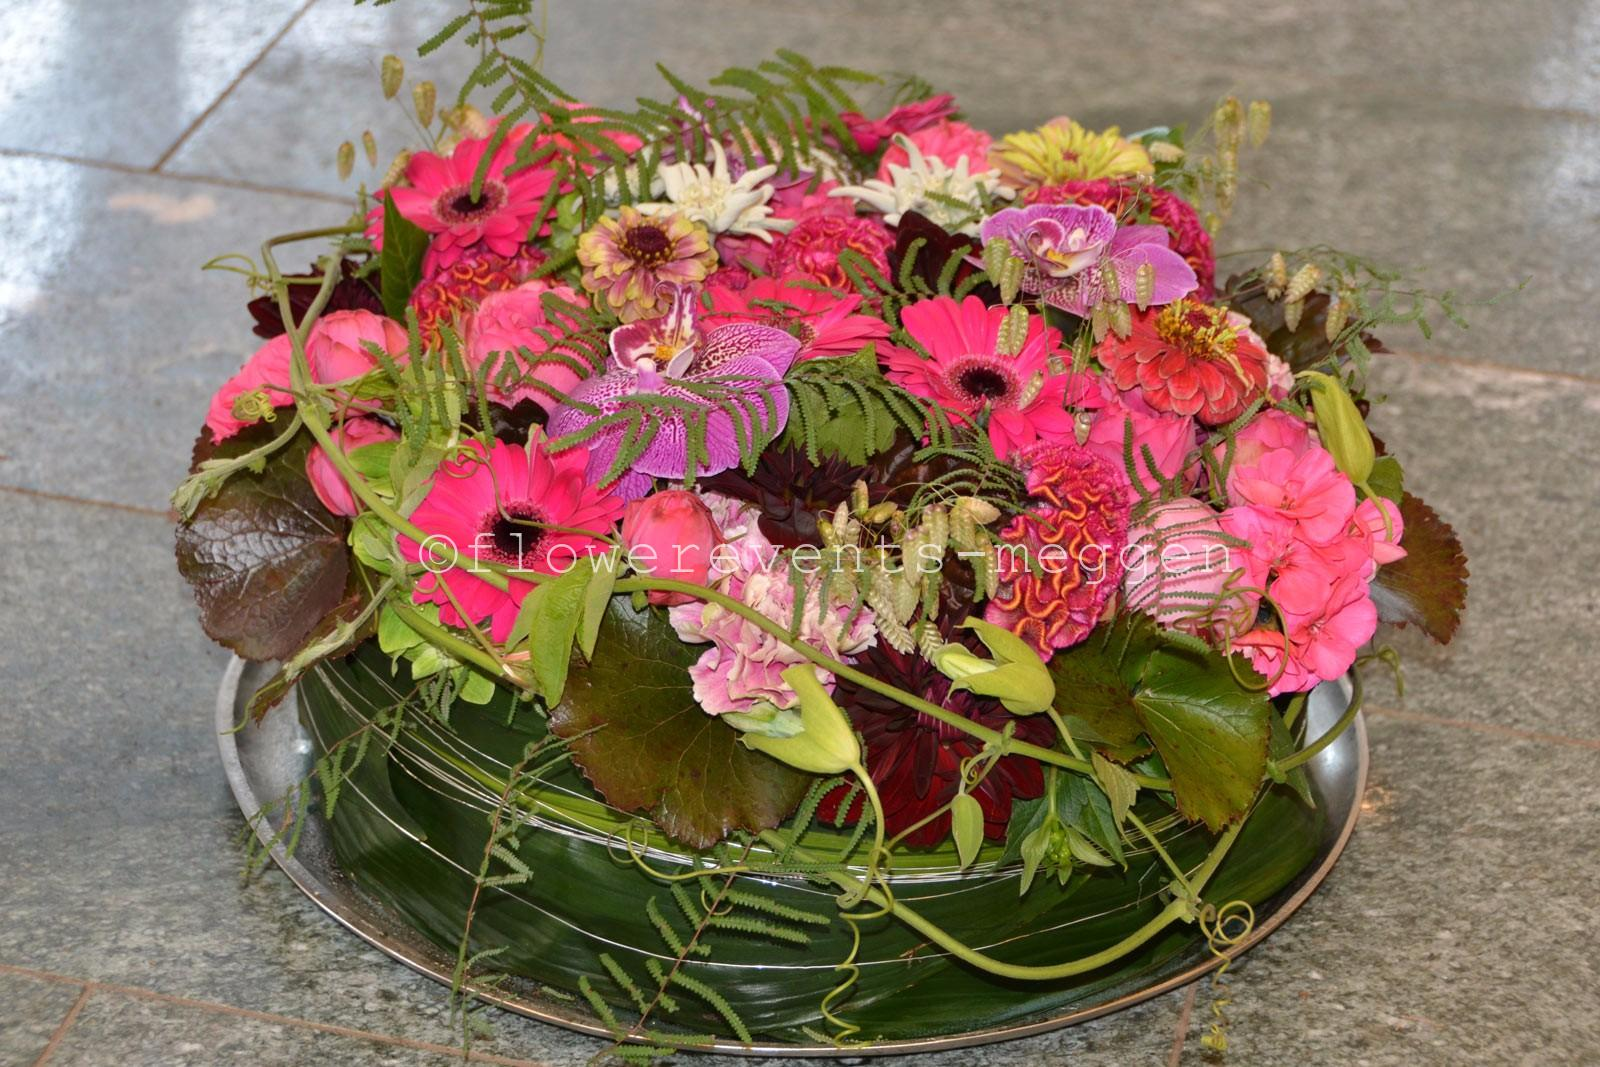 muttertag luzern blumen flowerevents meggen k ssnacht flowers. Black Bedroom Furniture Sets. Home Design Ideas